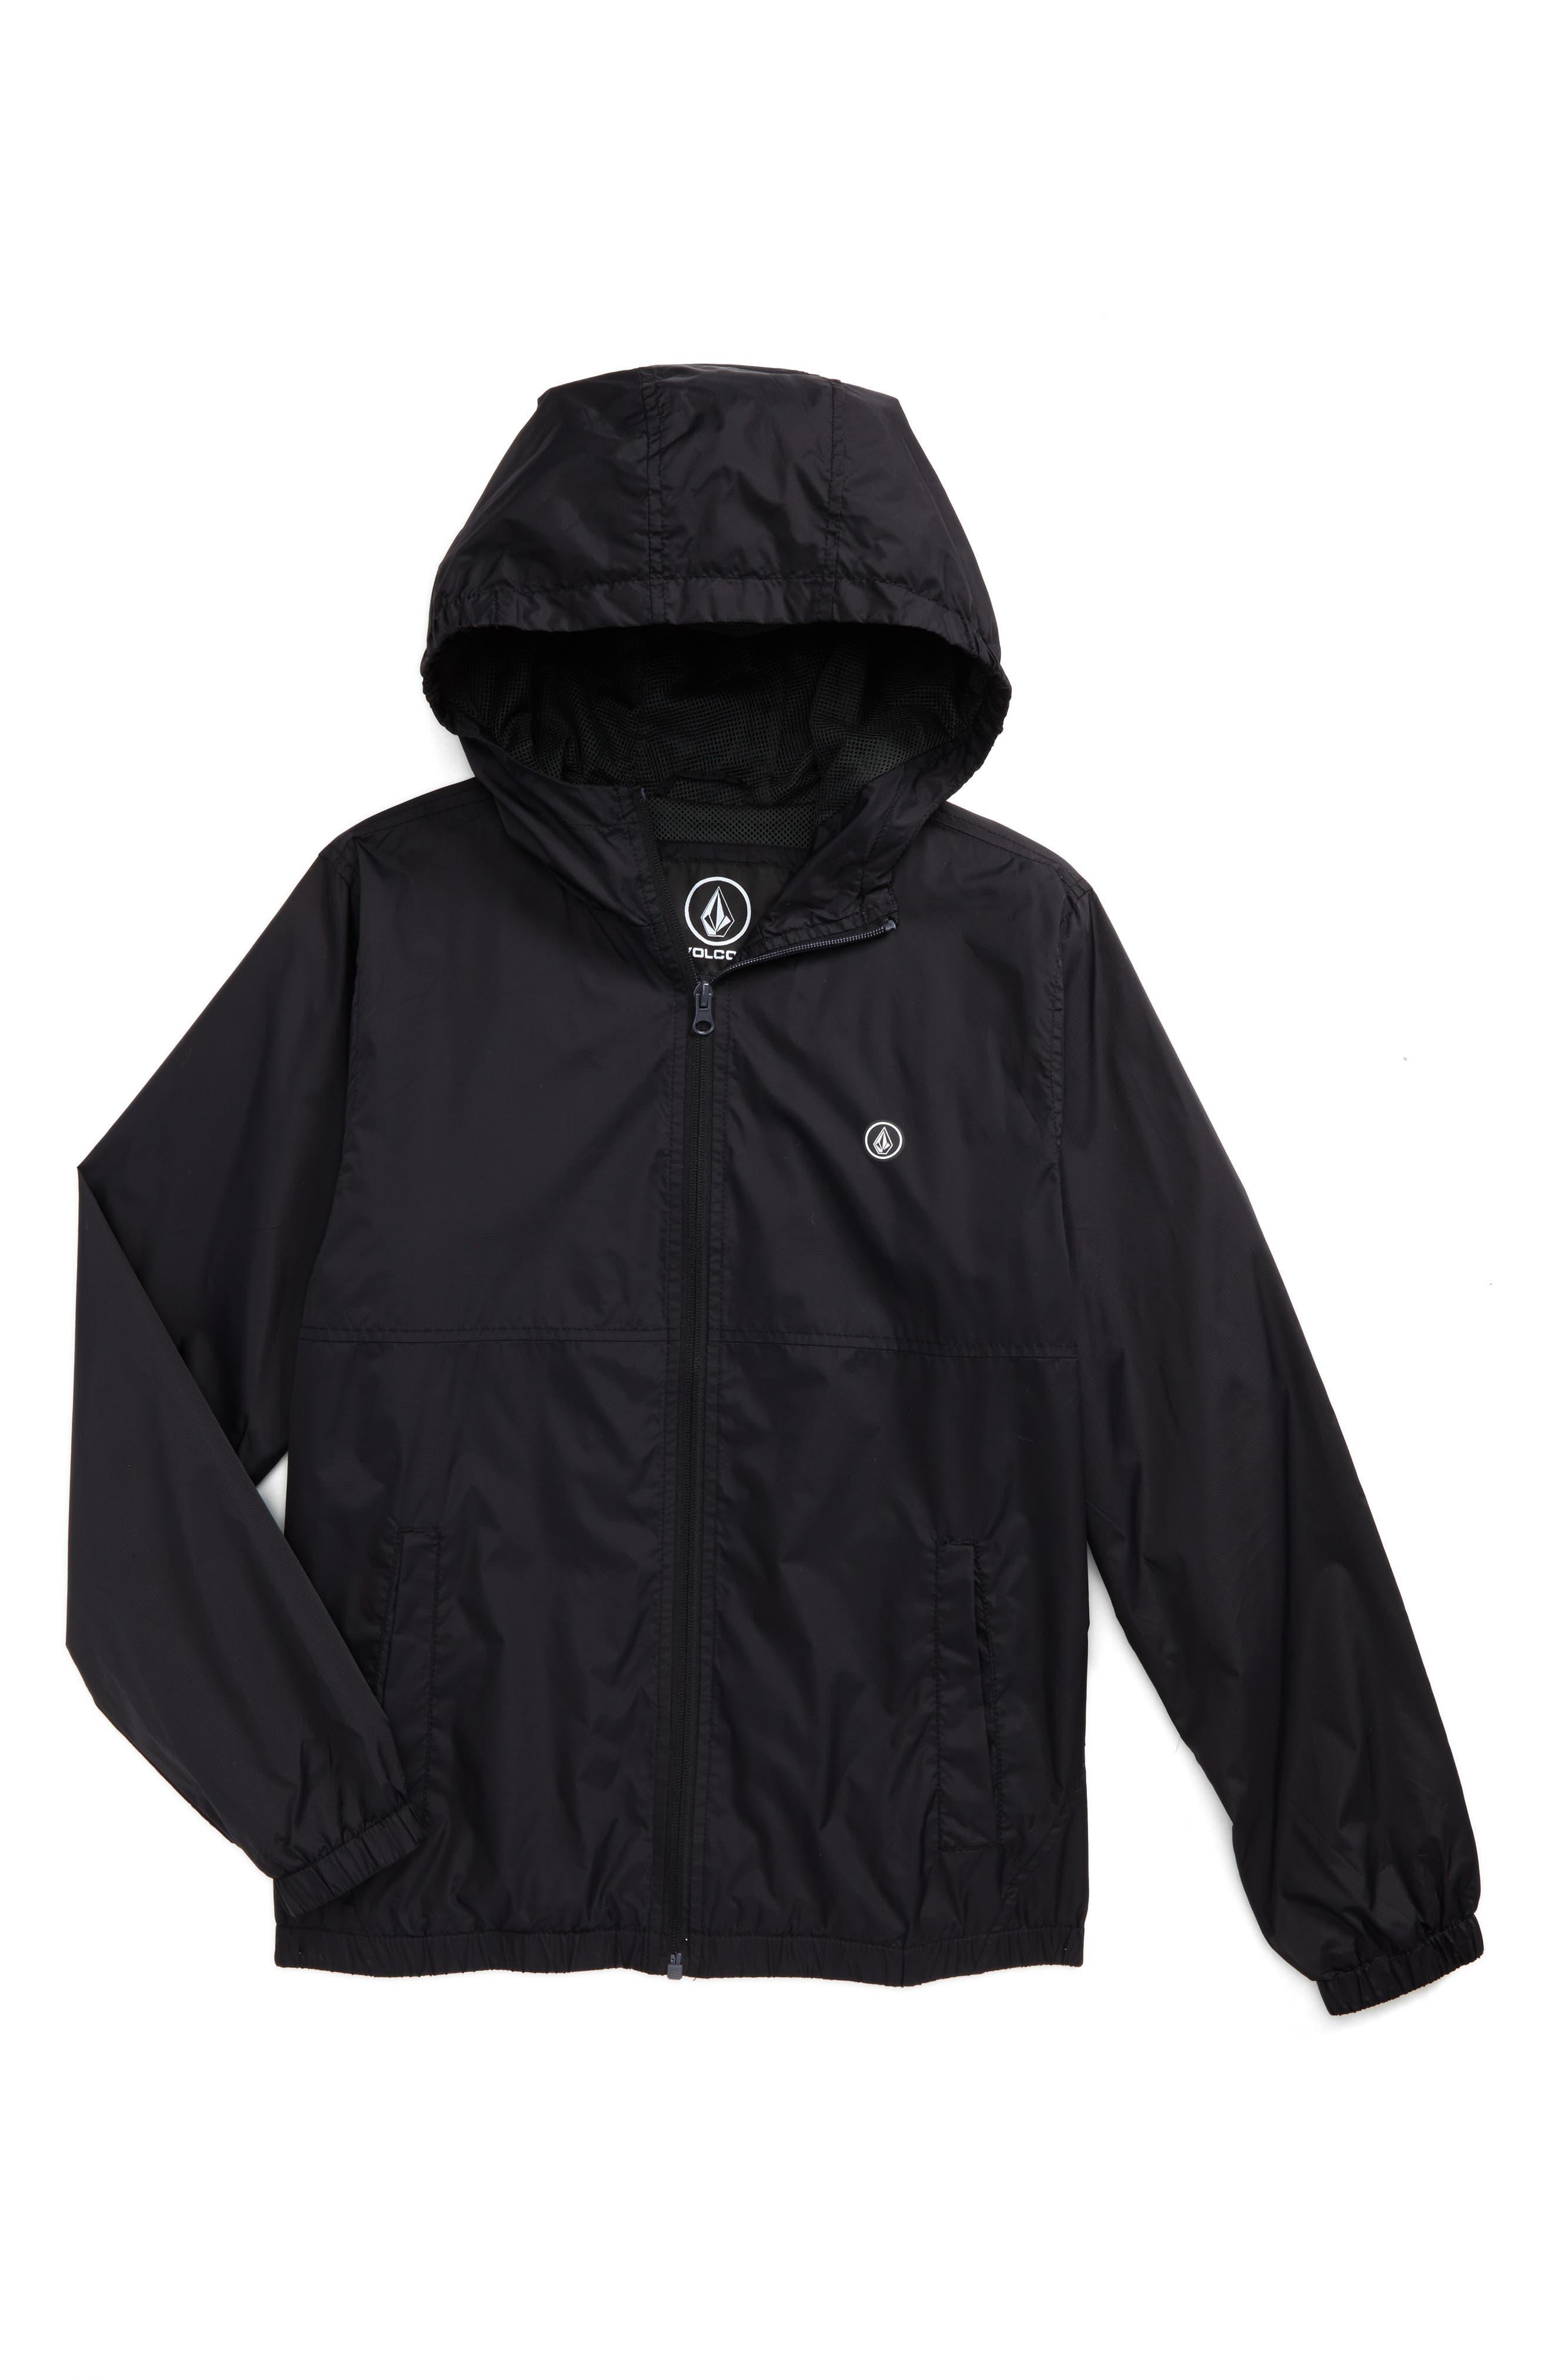 Ermont Hooded Nylon Jacket,                         Main,                         color, Black